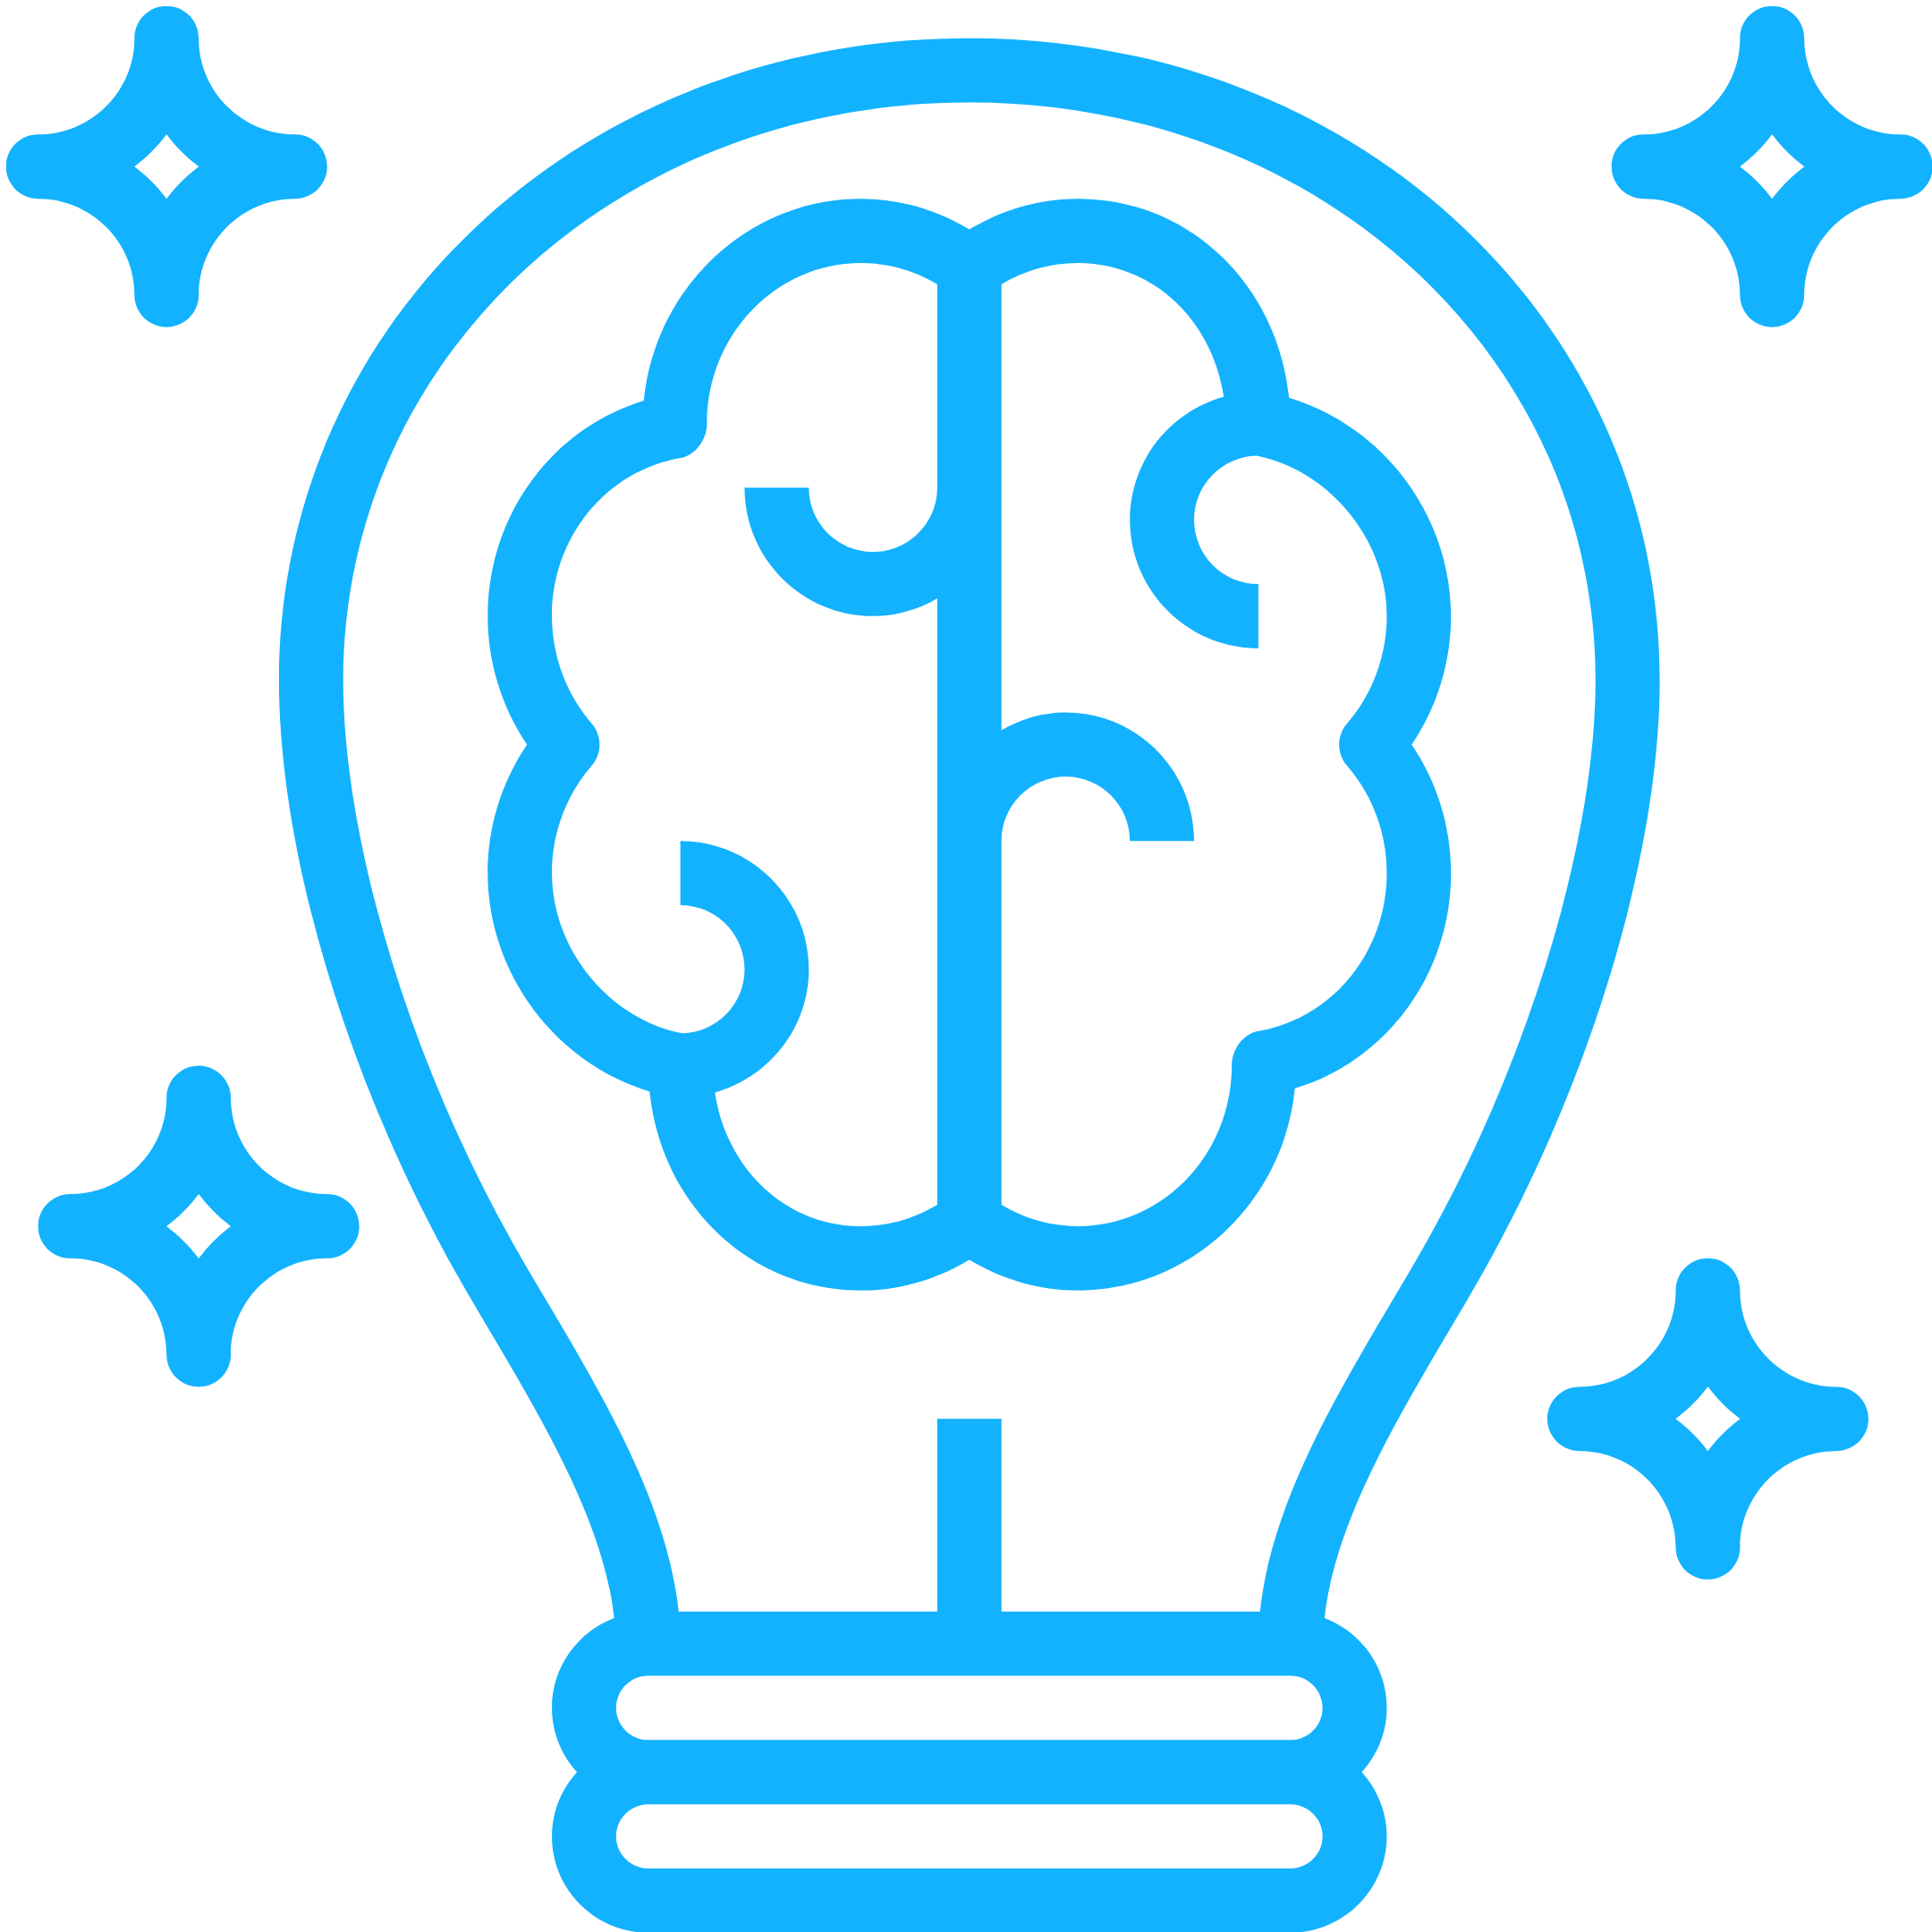 Formation - Initiation au Design Thinking